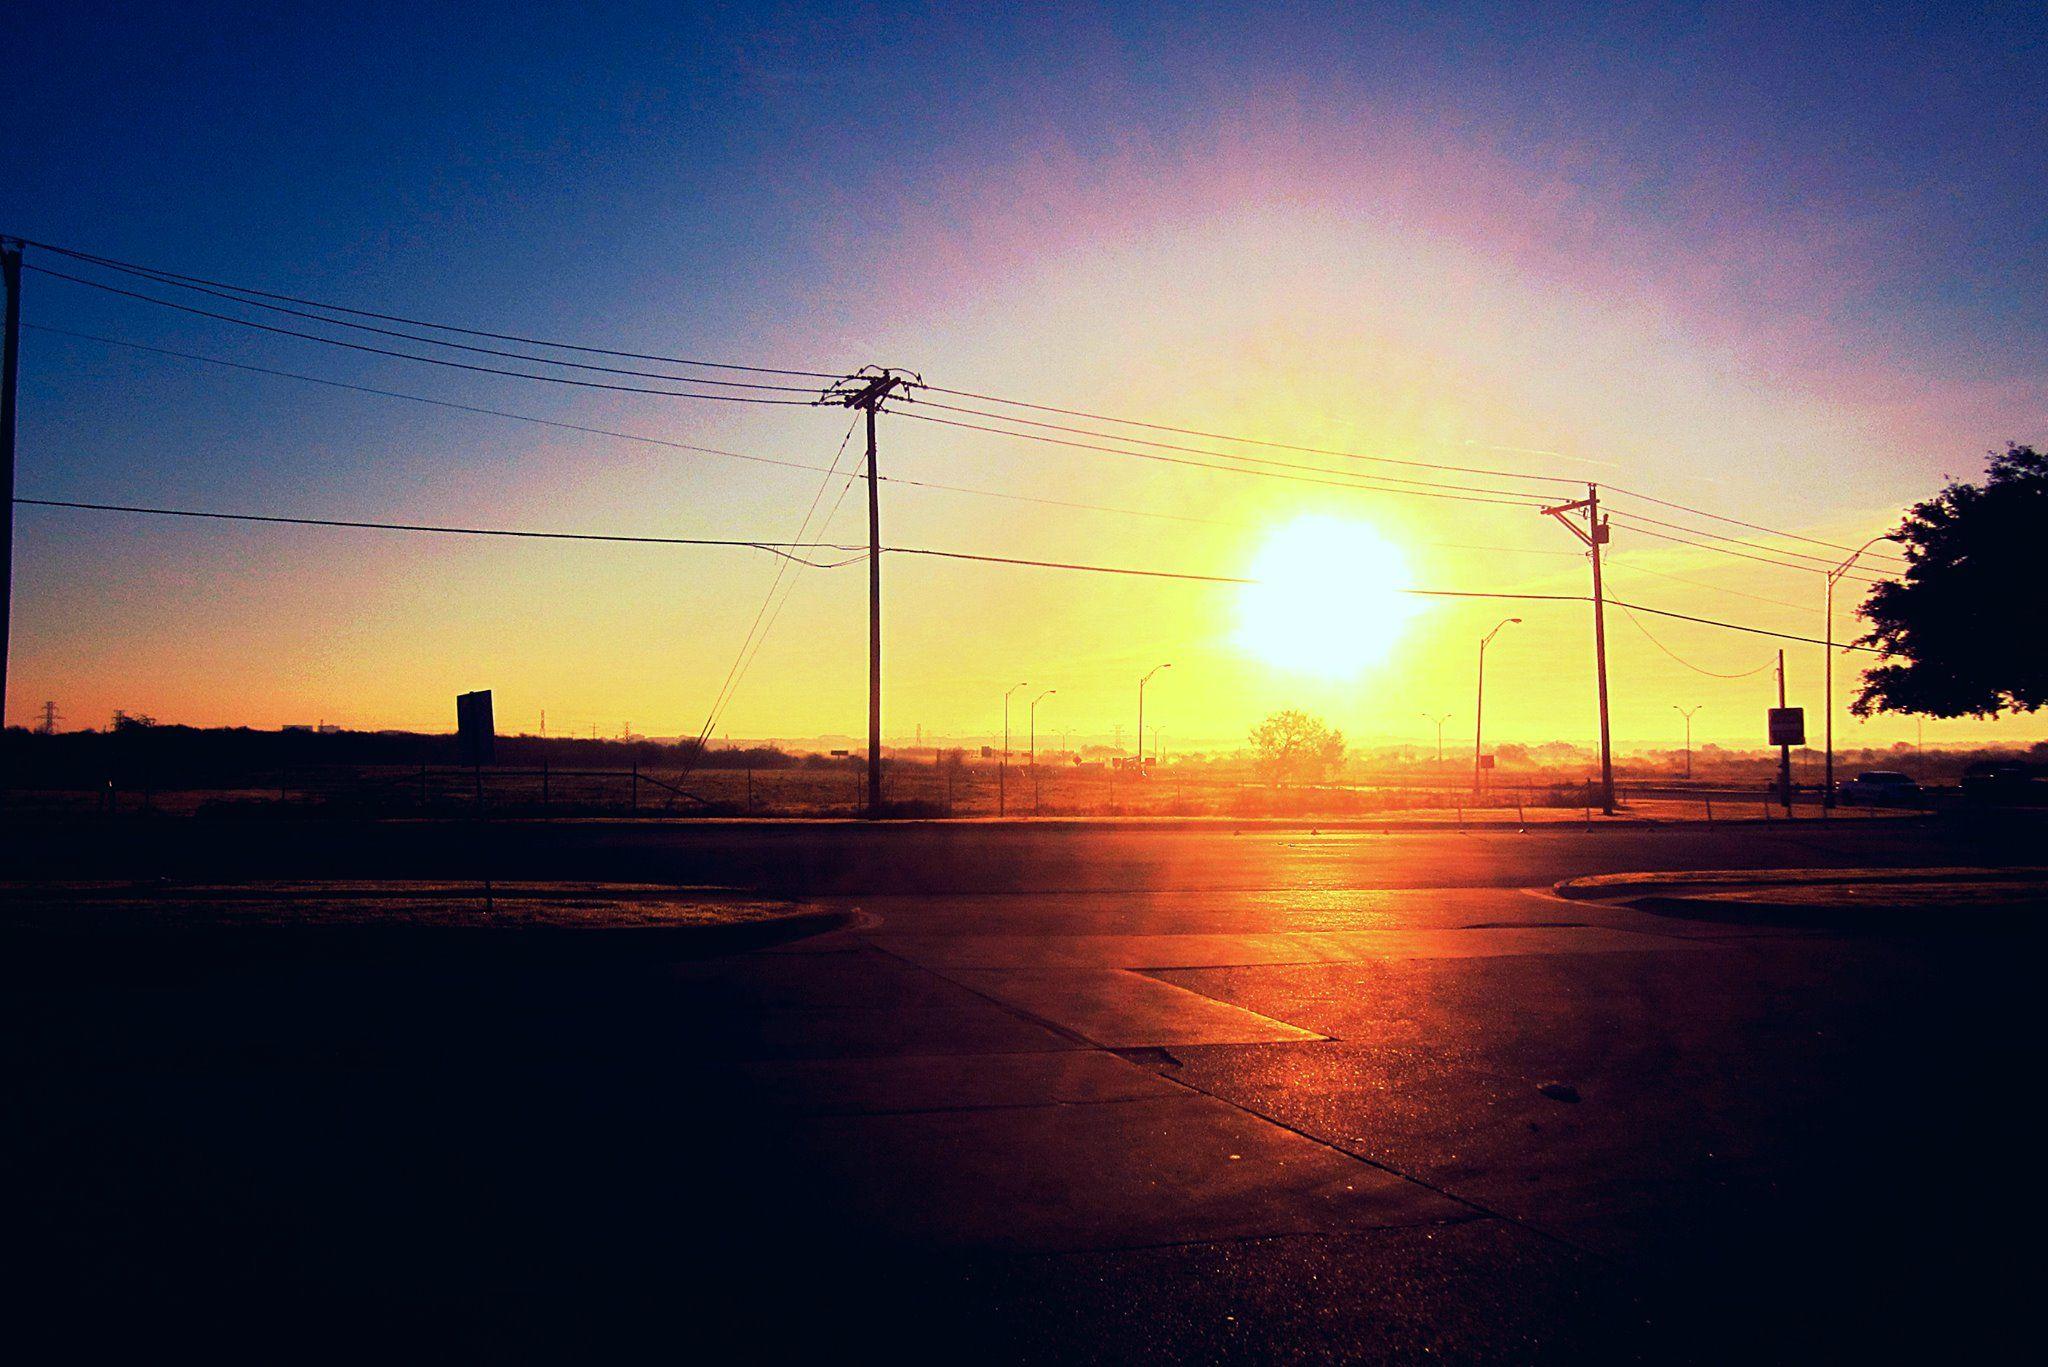 The Sunrise in Benbrook, Texas